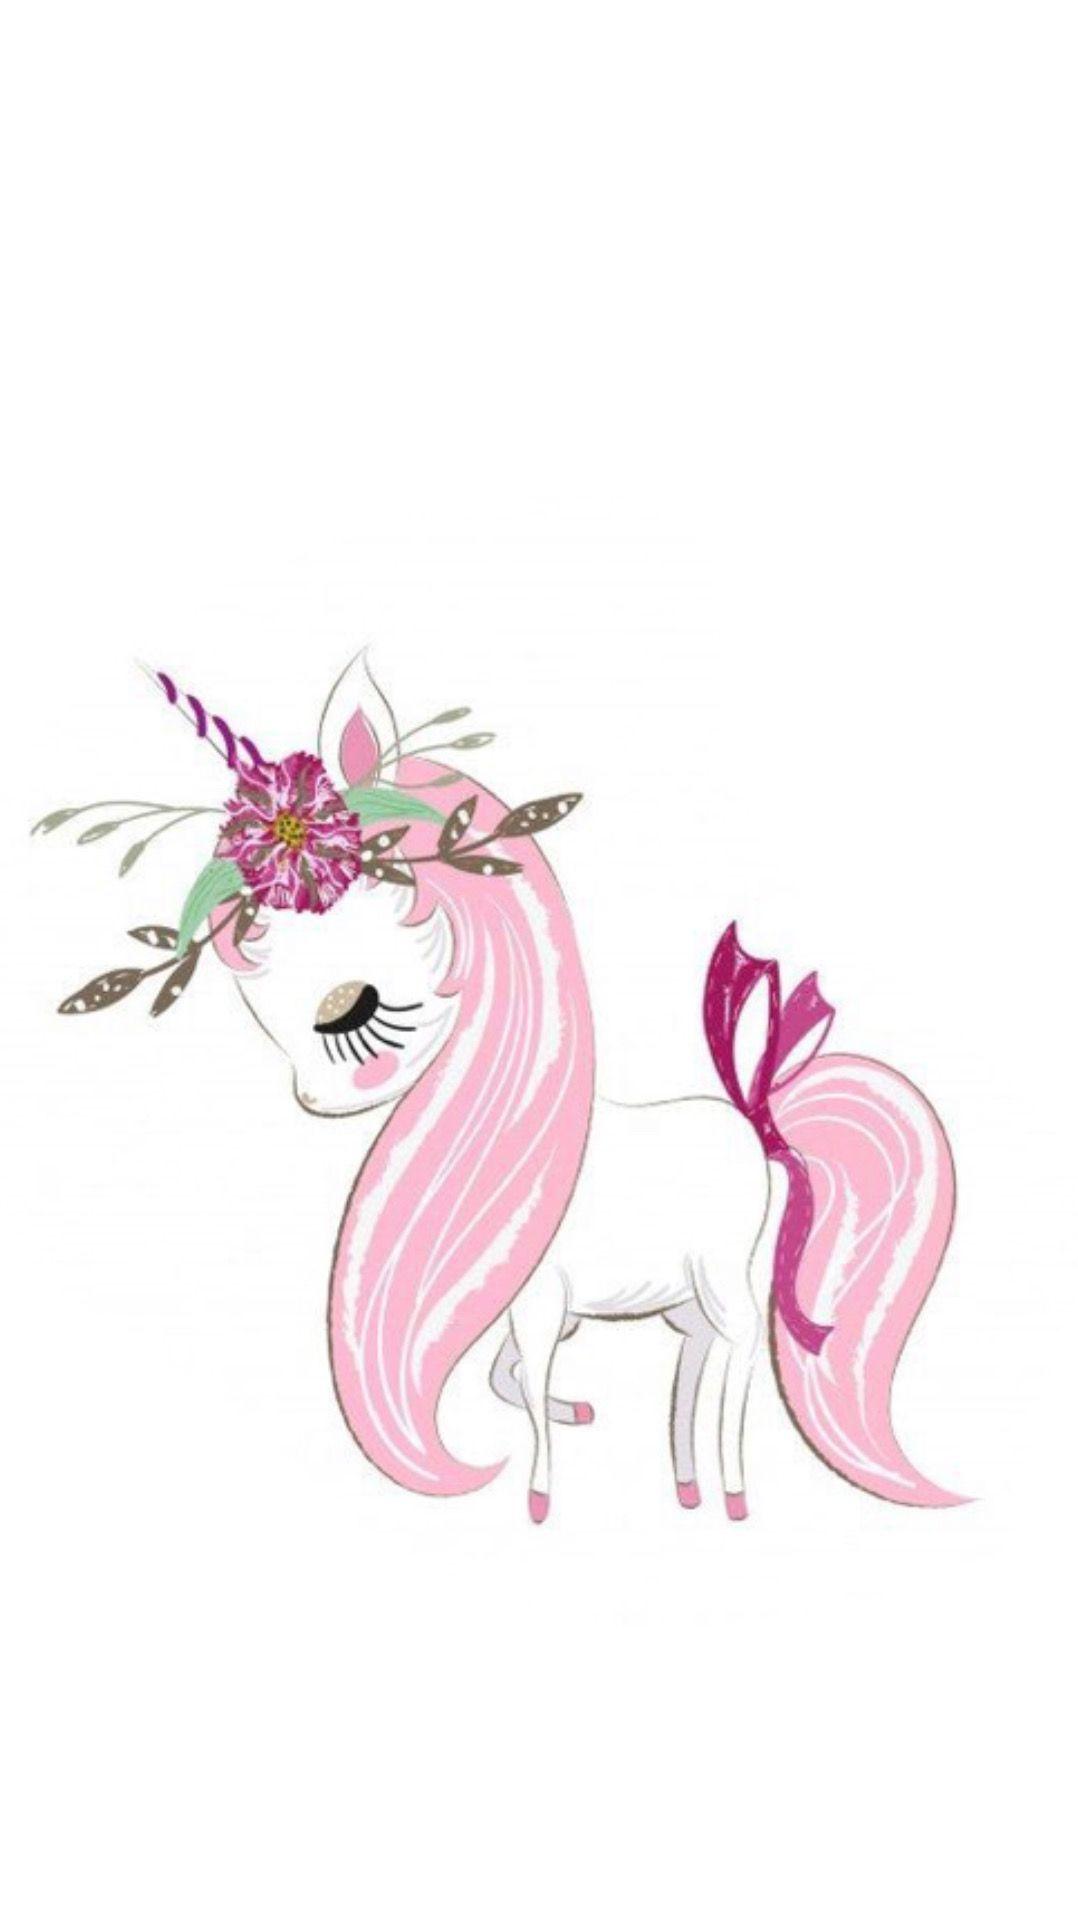 Unicornio Unicorn Wallpaper Cute Unicorn Wallpaper Unicorn Backgrounds